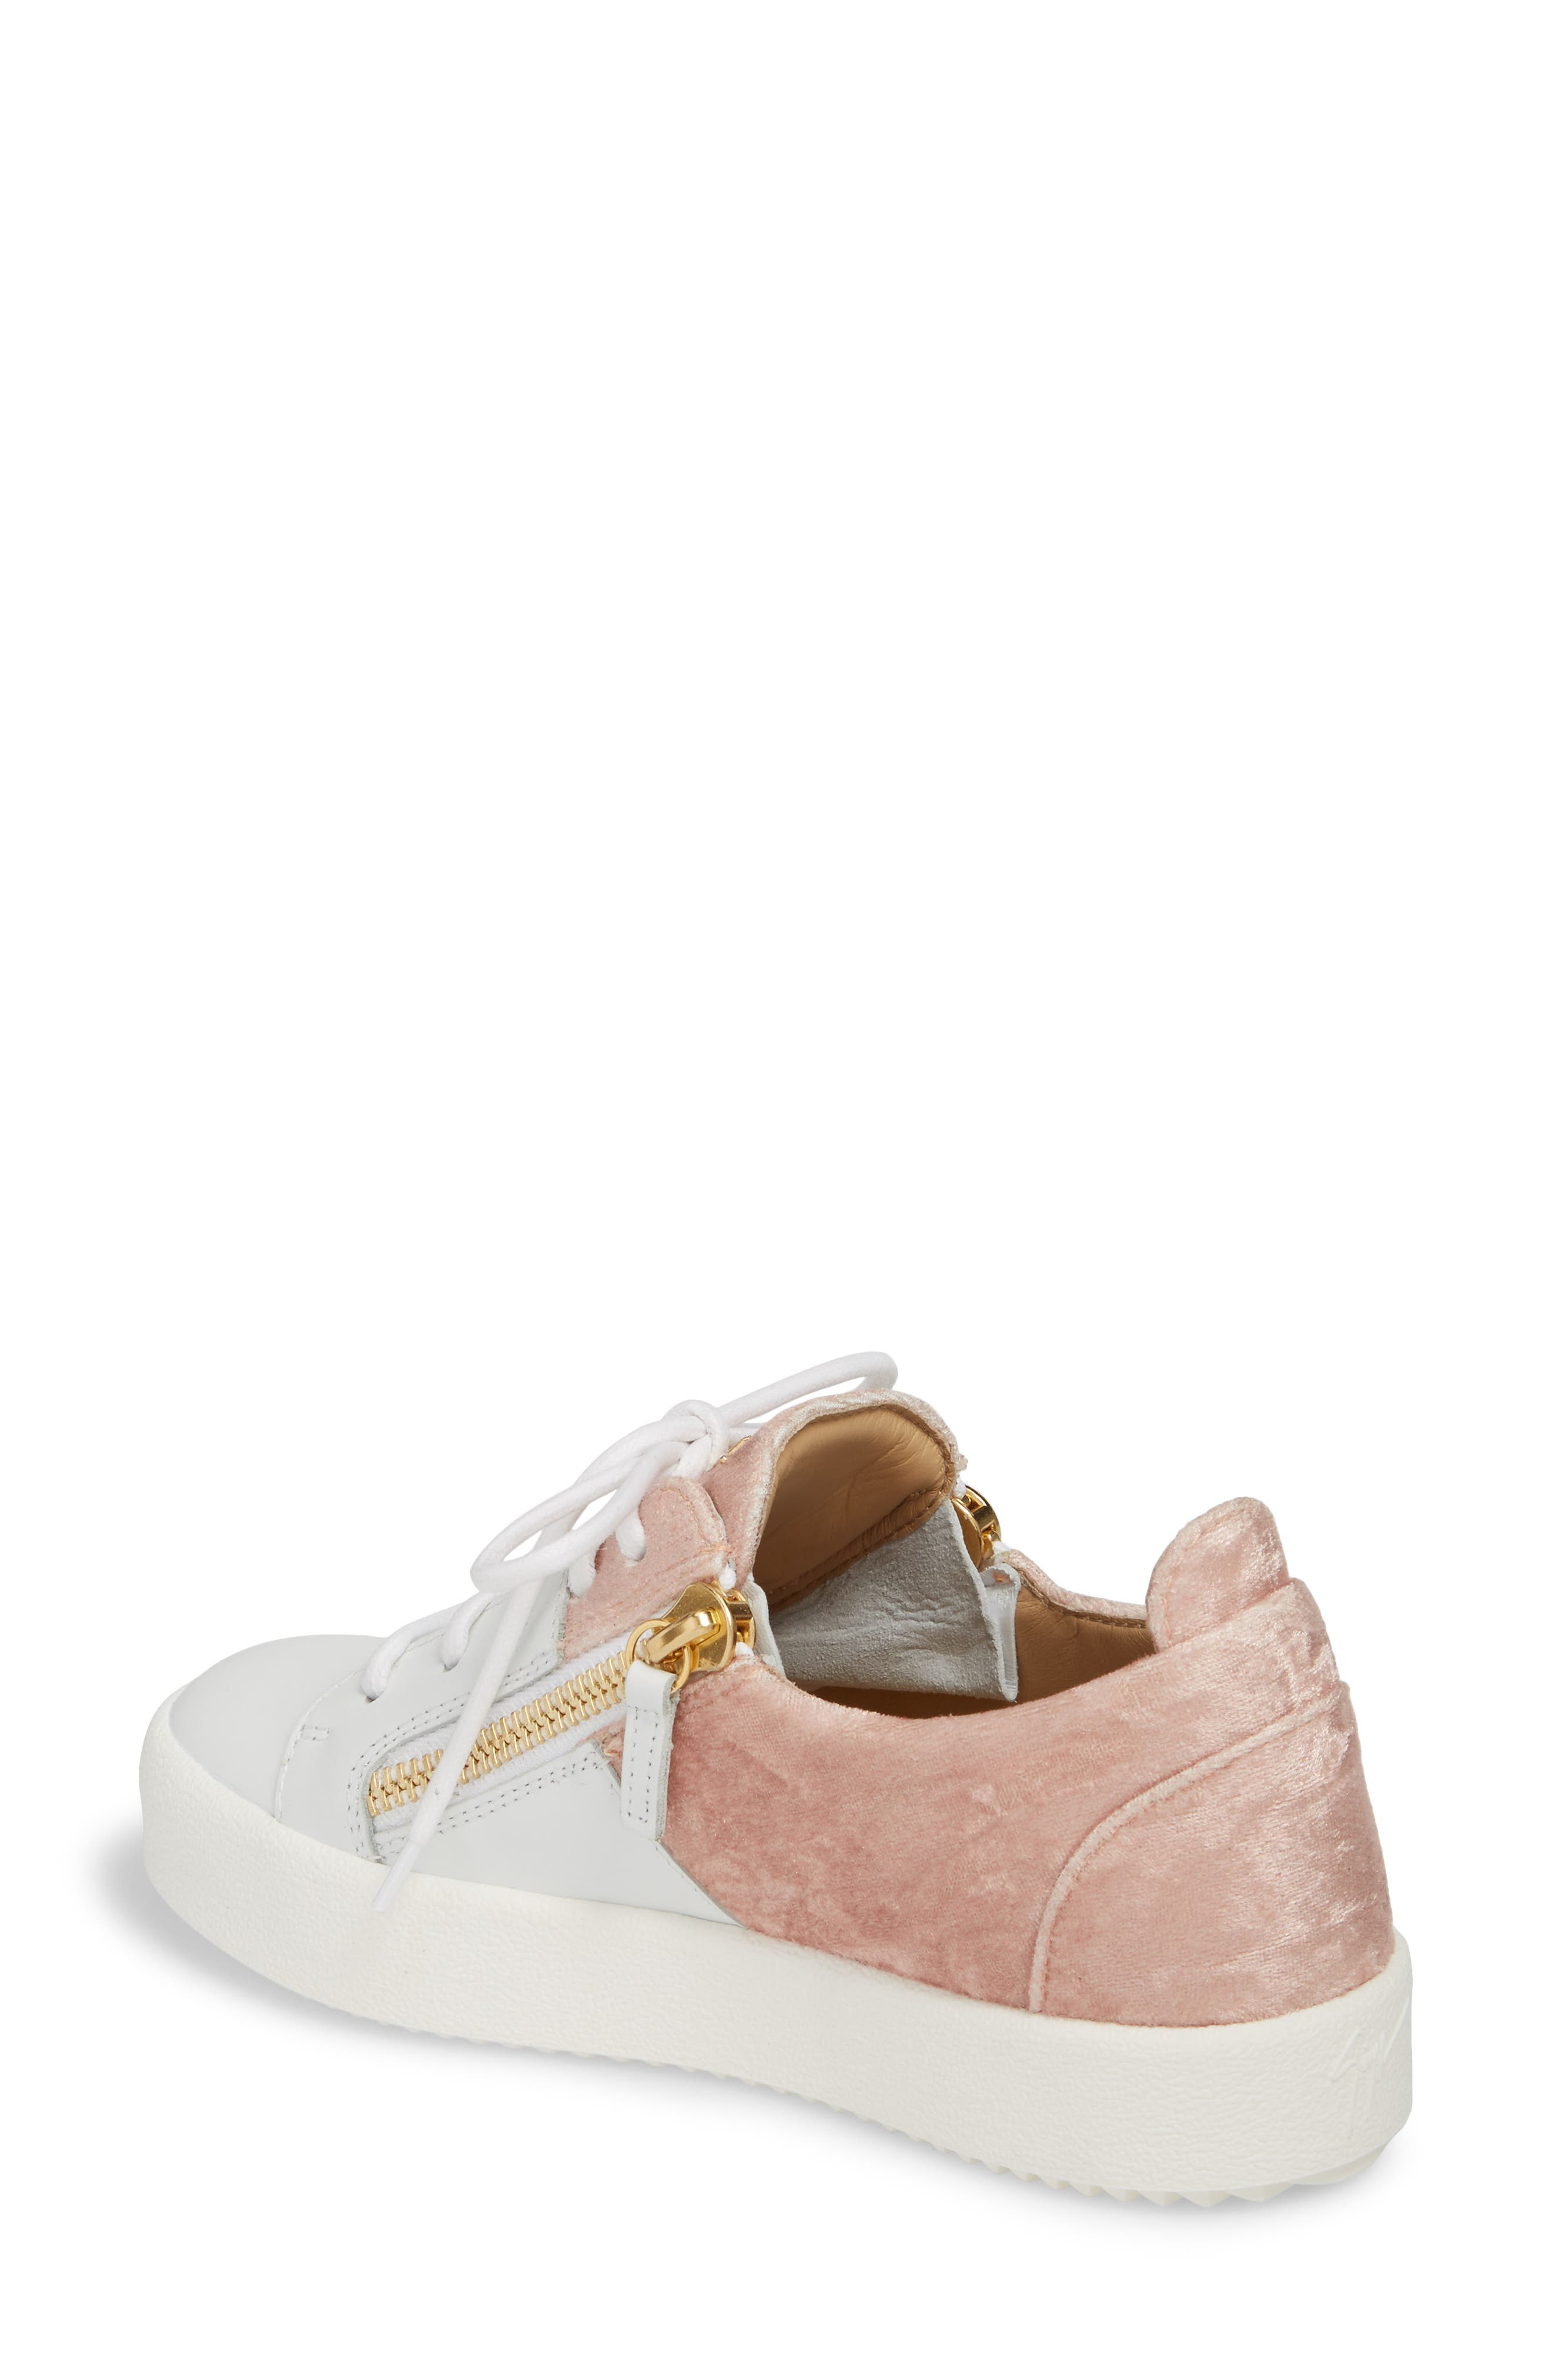 Alternate Image 2  - Giuseppe Zanotti Mid Top Platform Sneaker (Women)